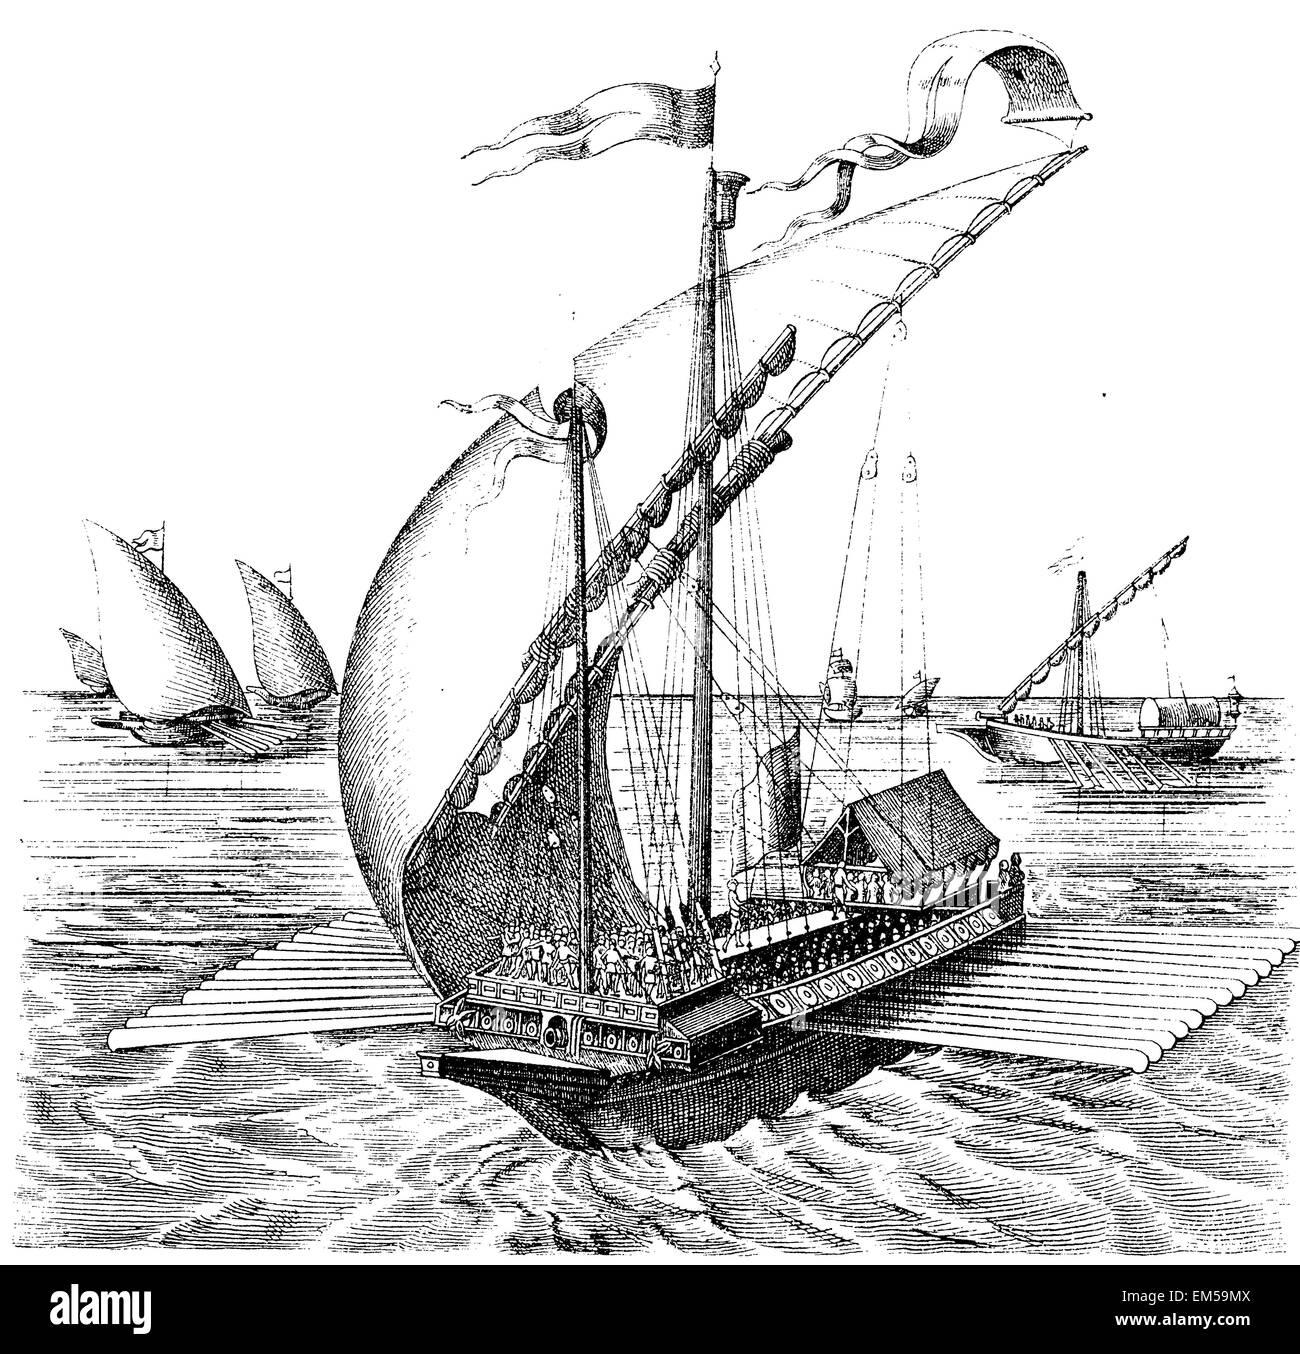 Venetian galley - Stock Image